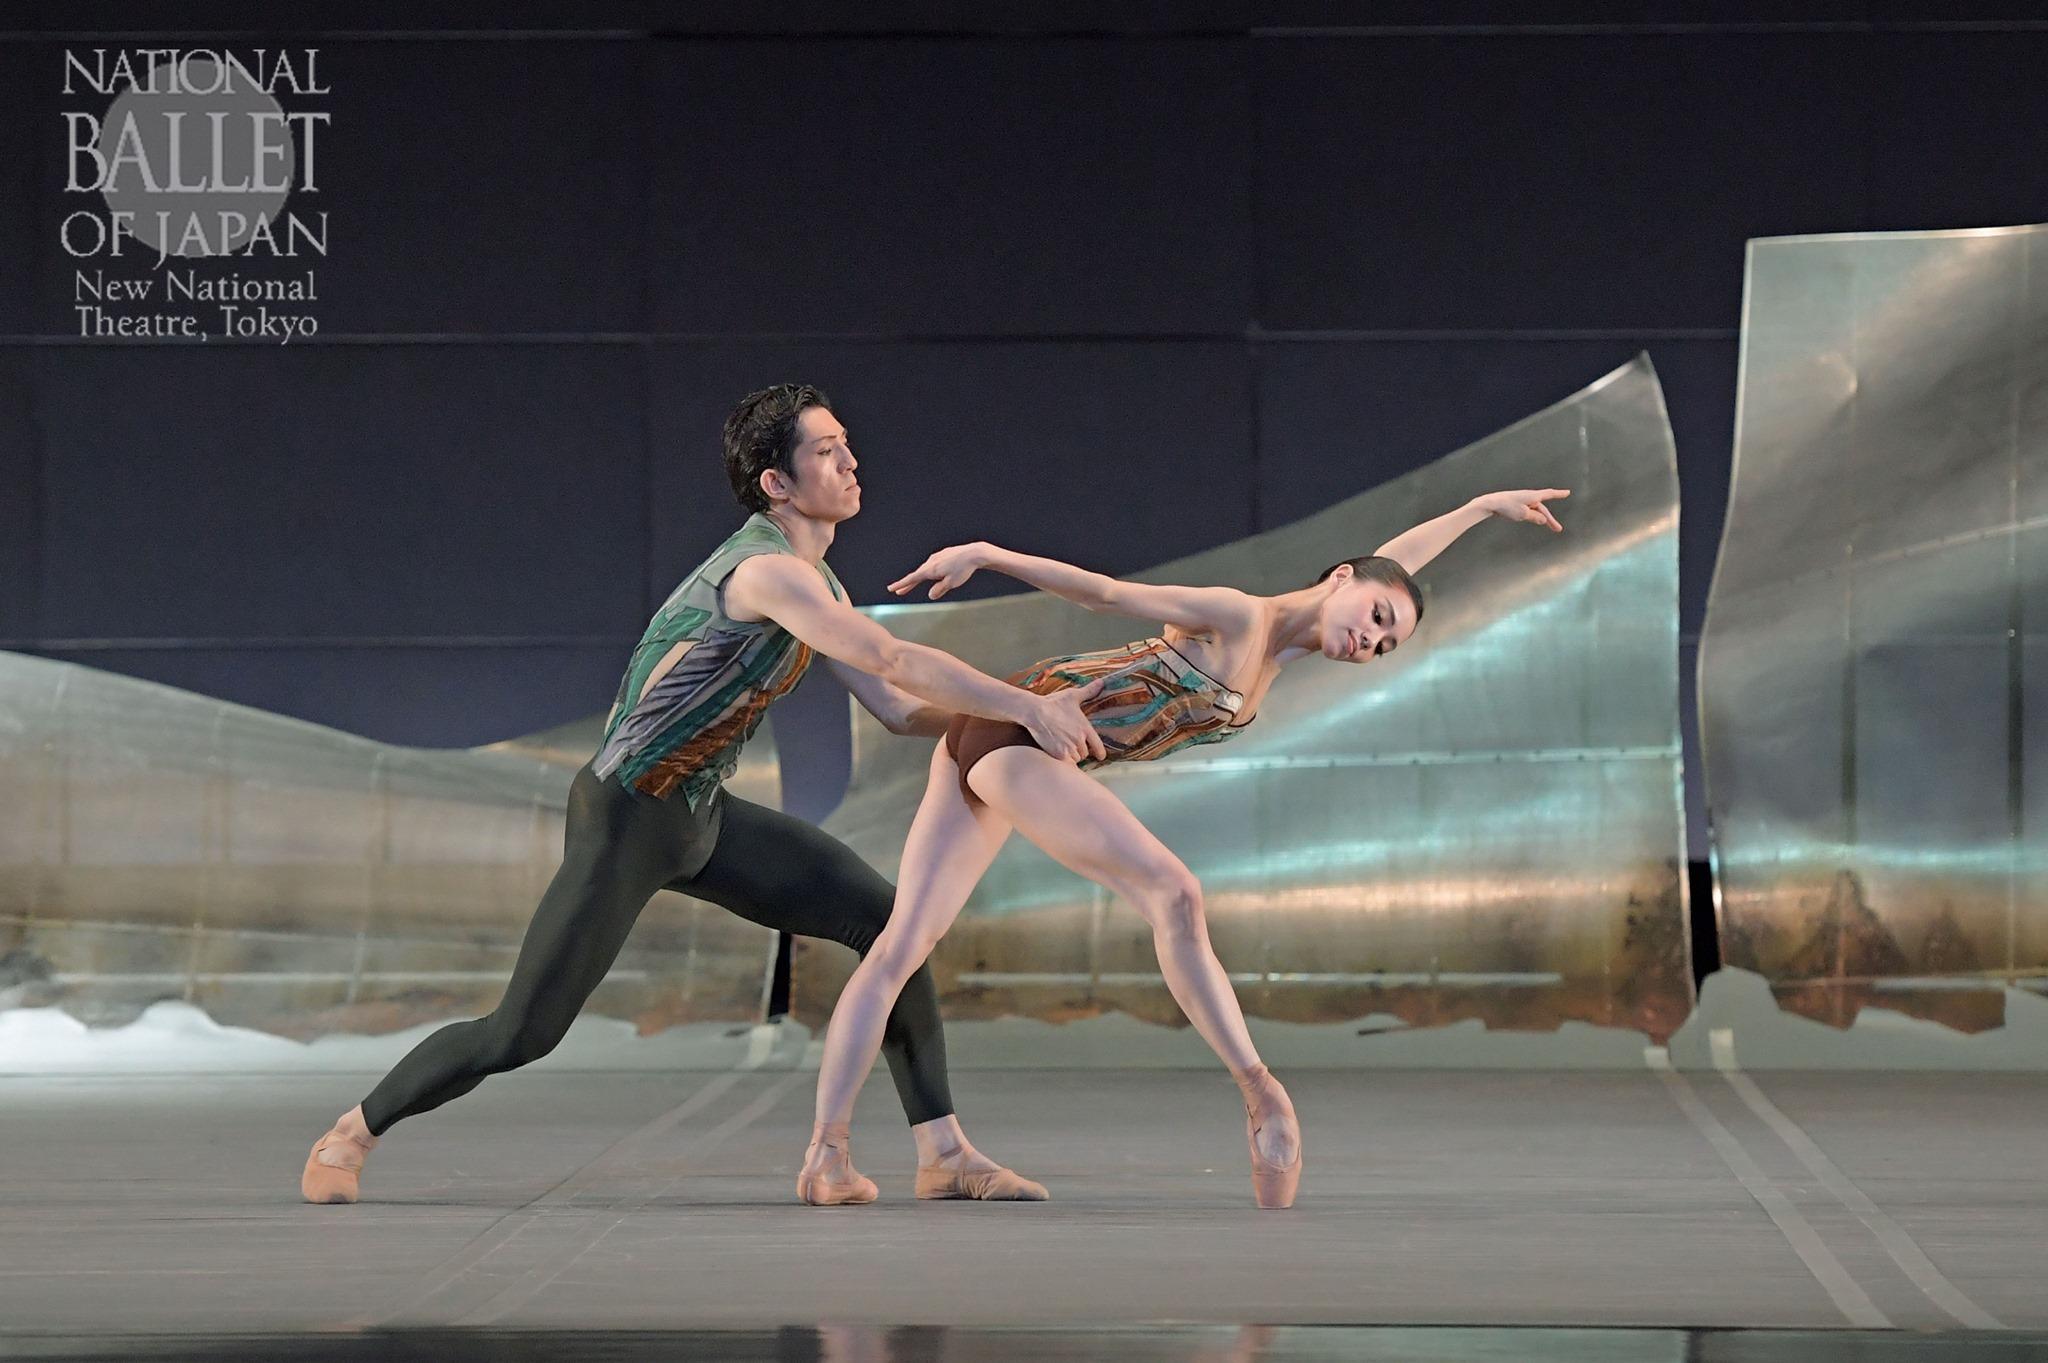 『DGV Danse à Grande Vitesse ©』小野絢子、木下嘉人(撮影:鹿摩隆司/写真提供:新国立劇場)